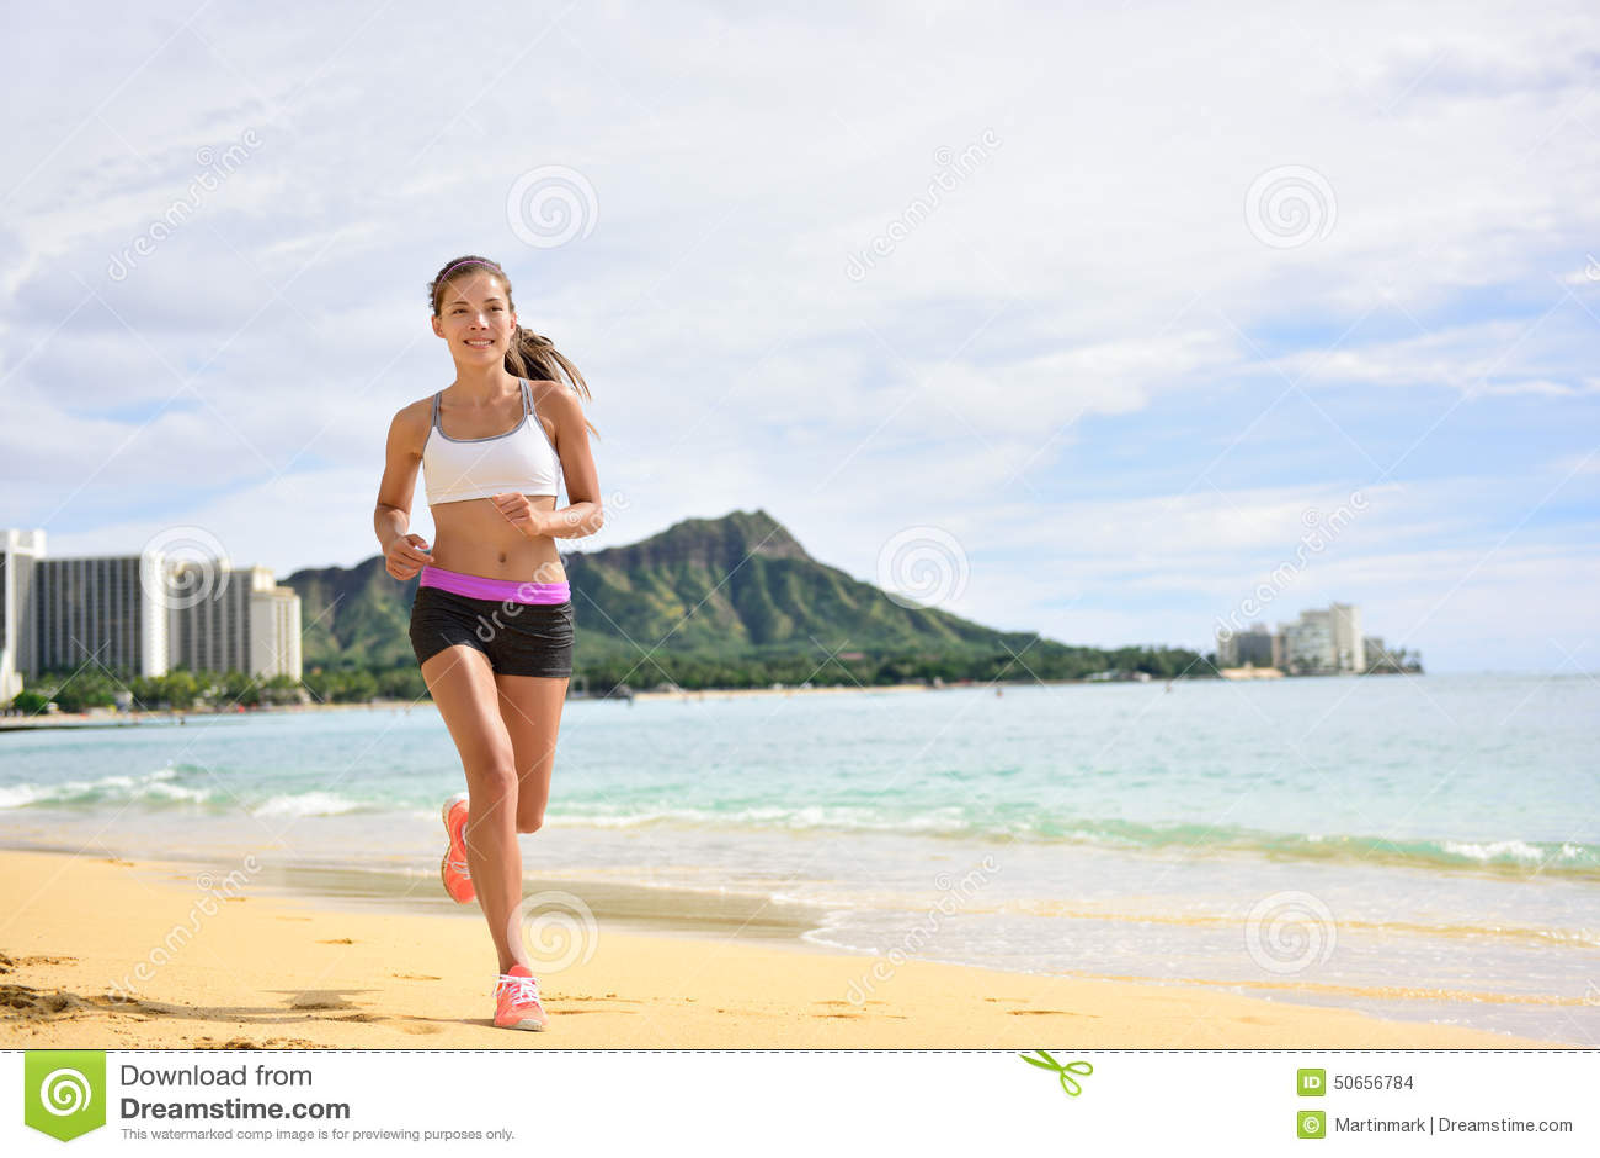 Sport running fitness woman jogging on beach run